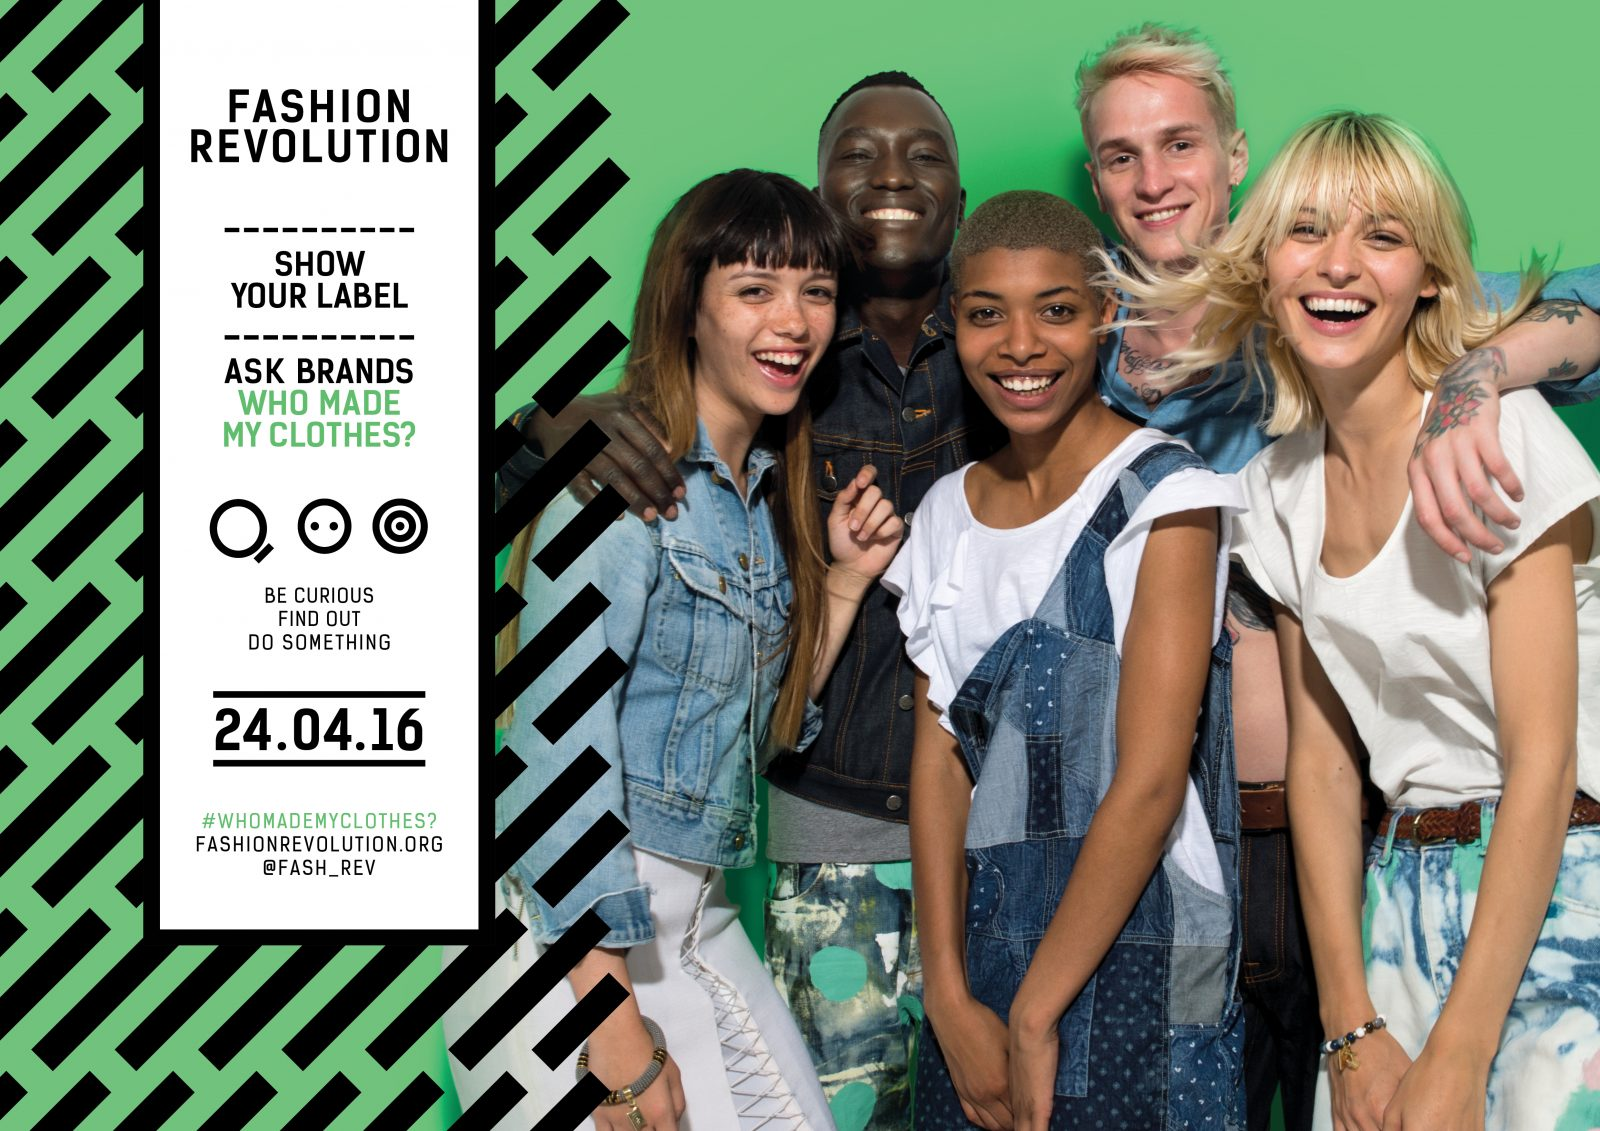 Fashion Revoltuion Day Rana Plaza poster 24 avril